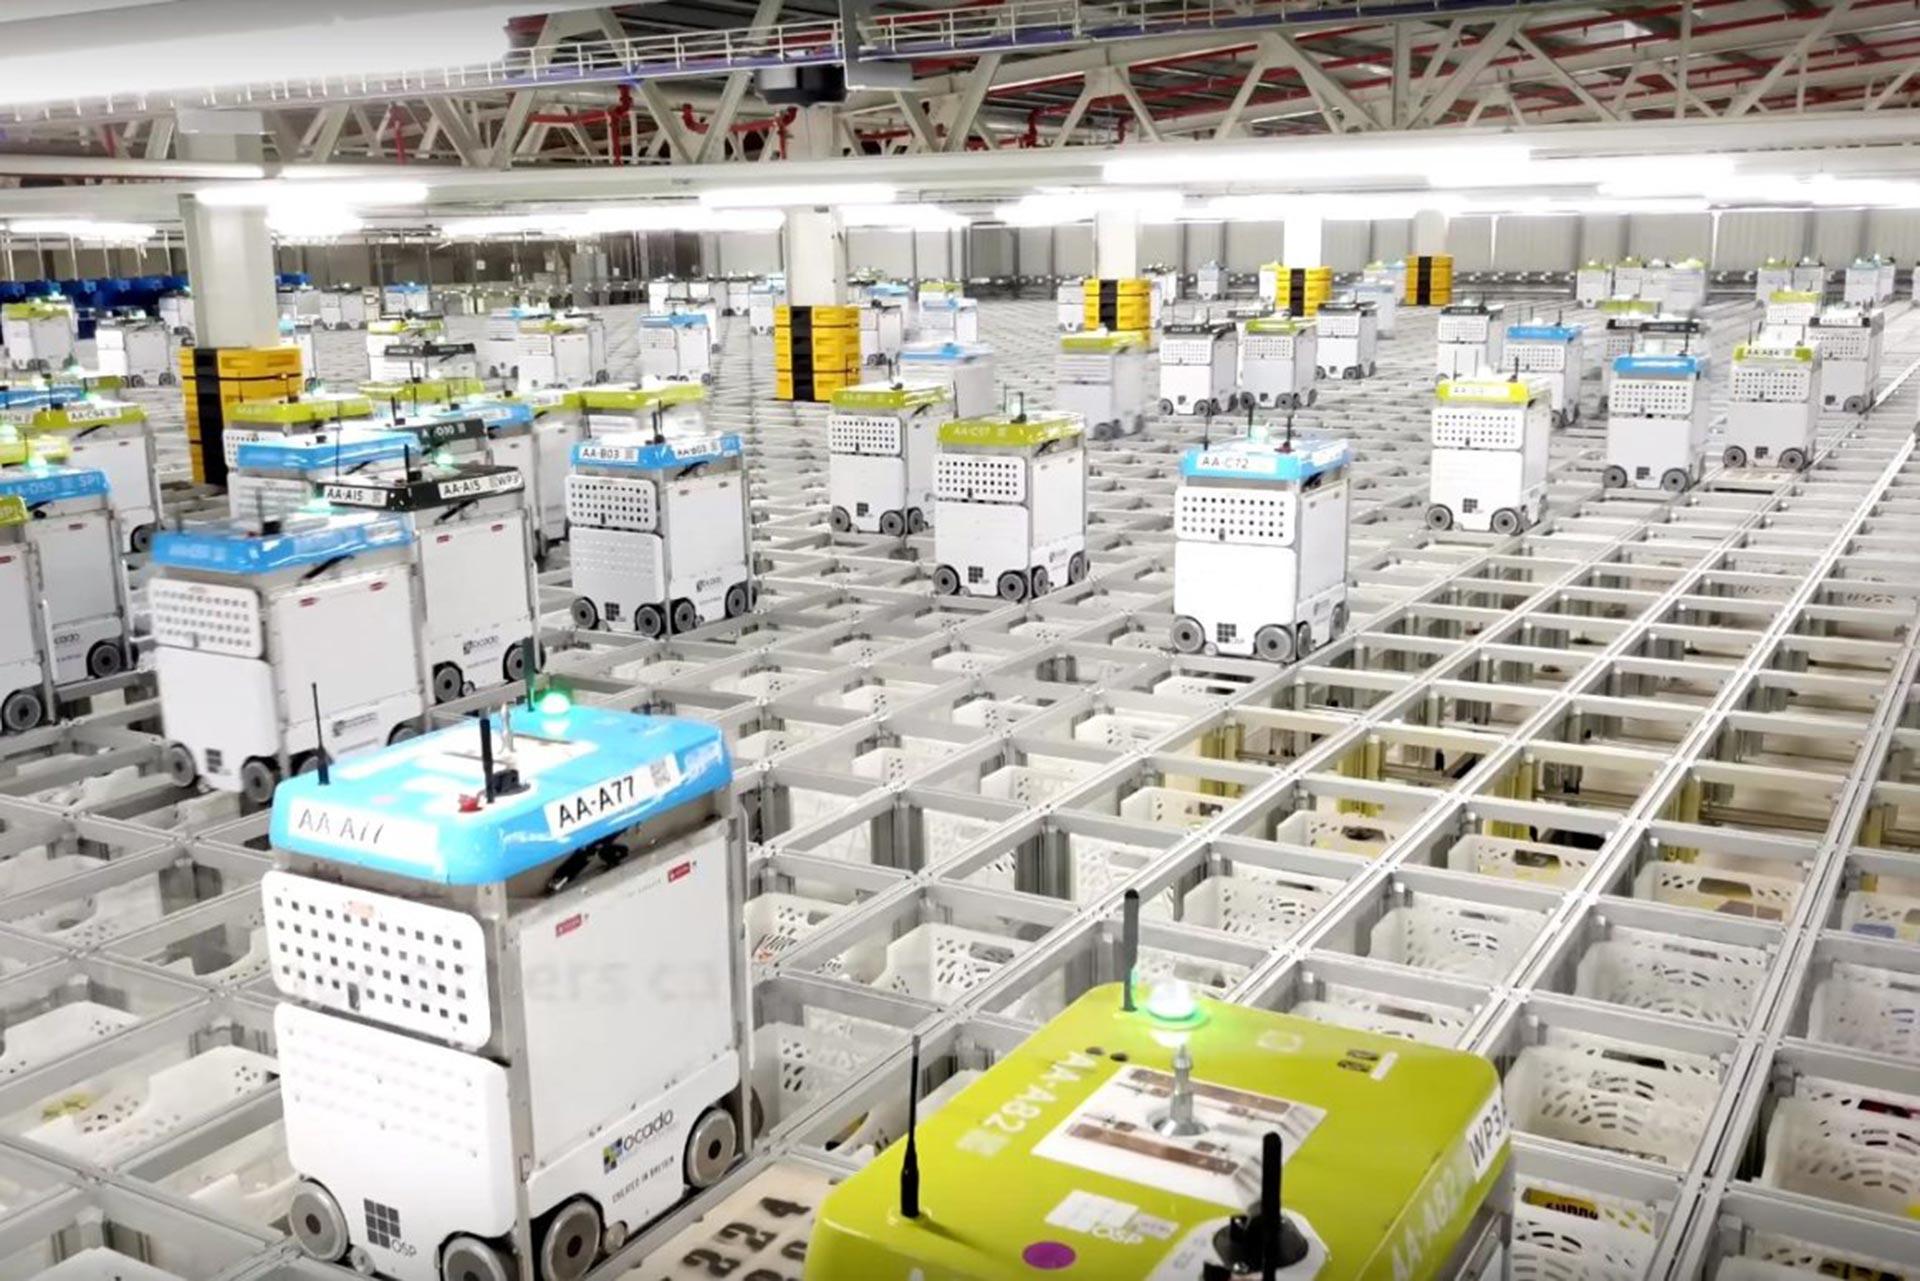 Image of Ocaado online grocery retailer warehouse